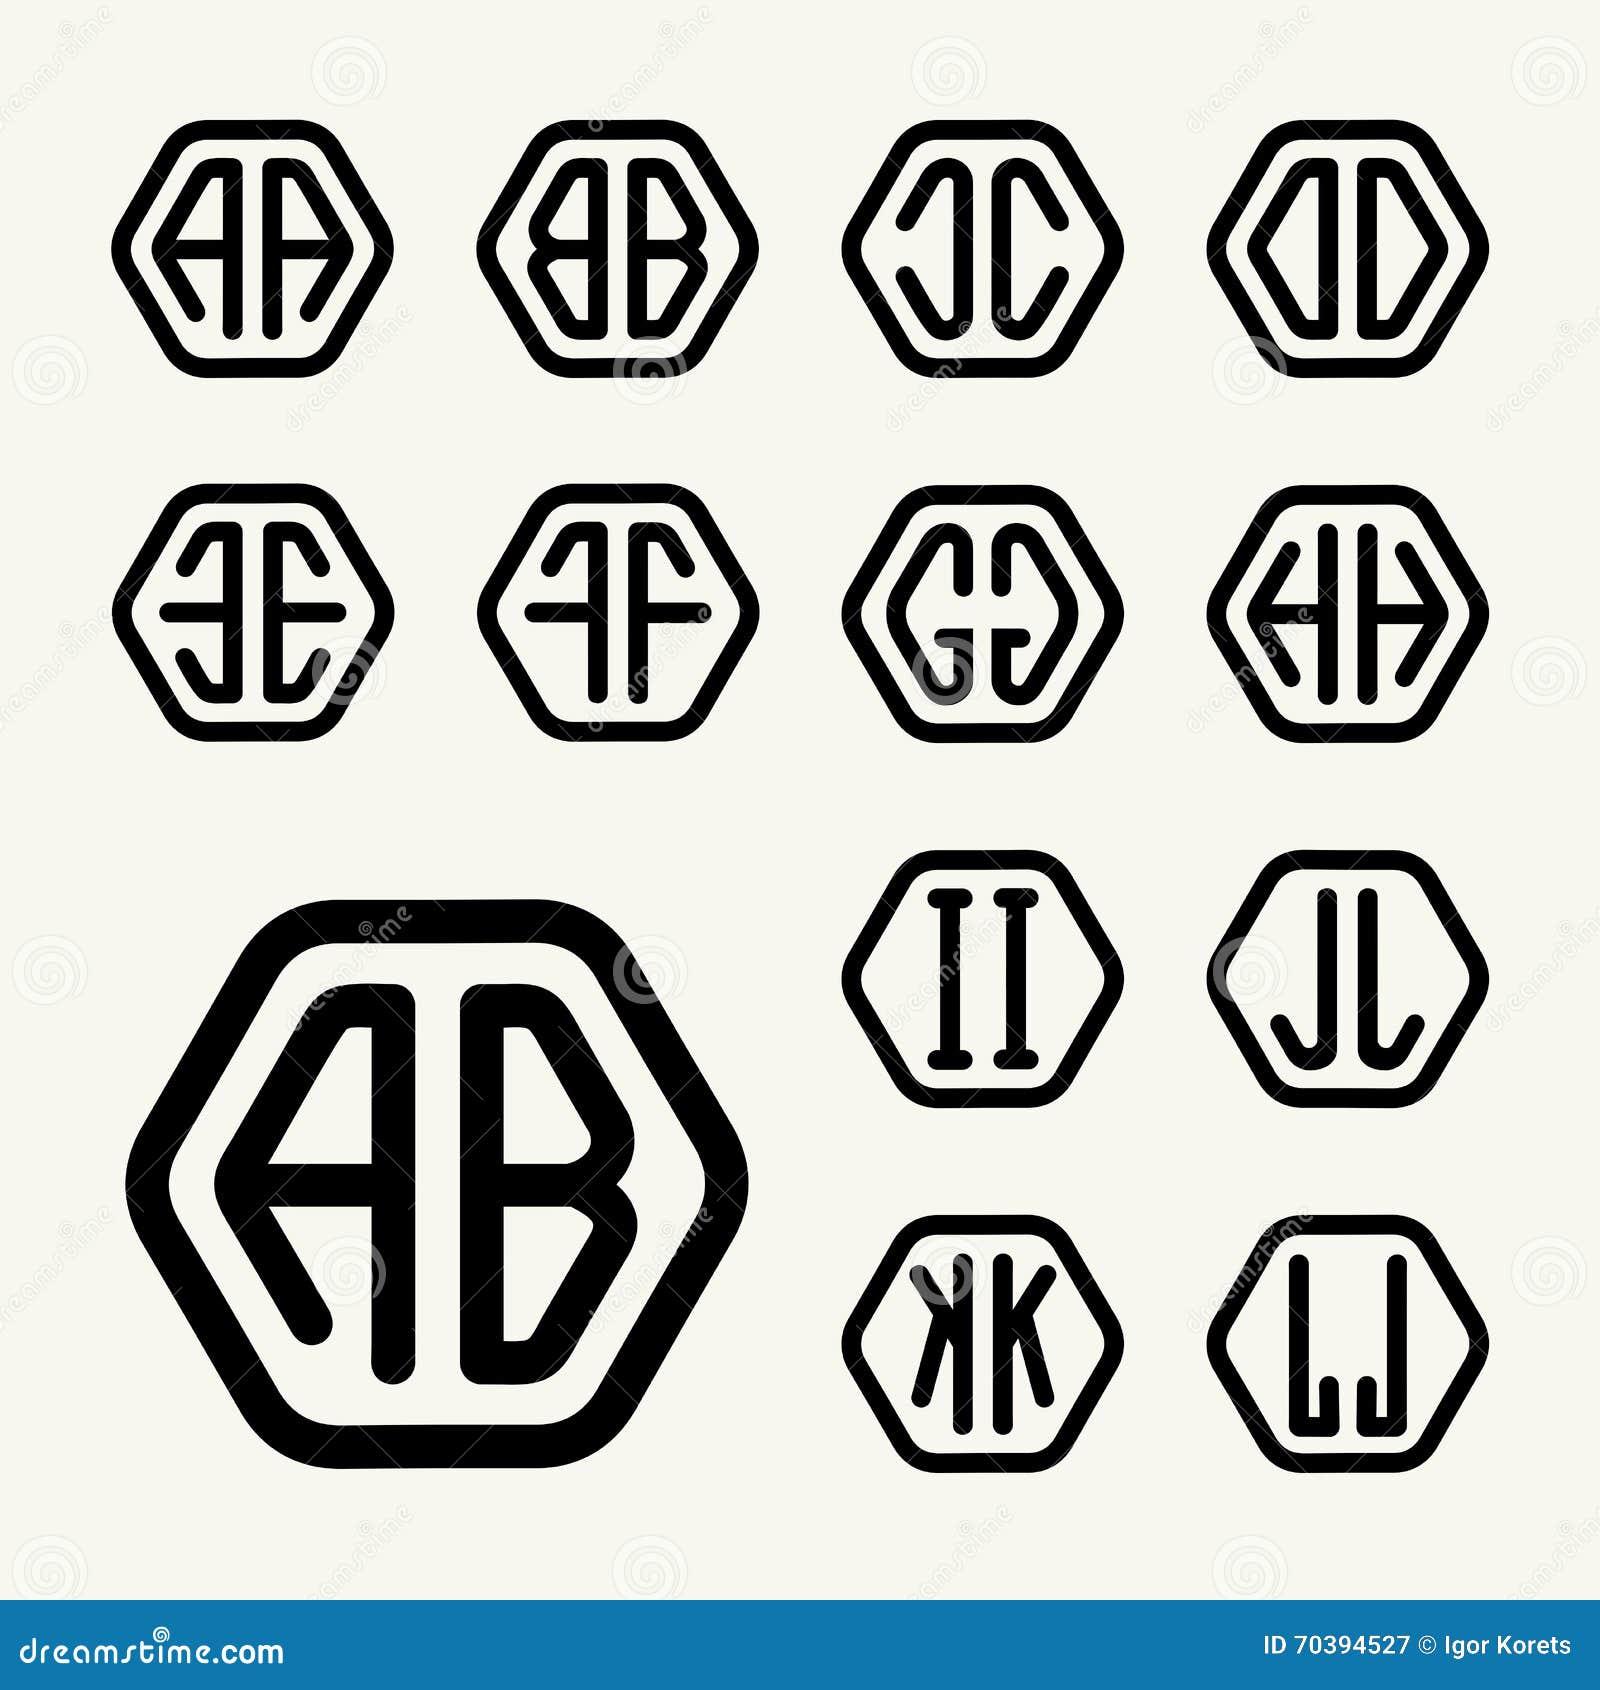 how to create a monogram logo